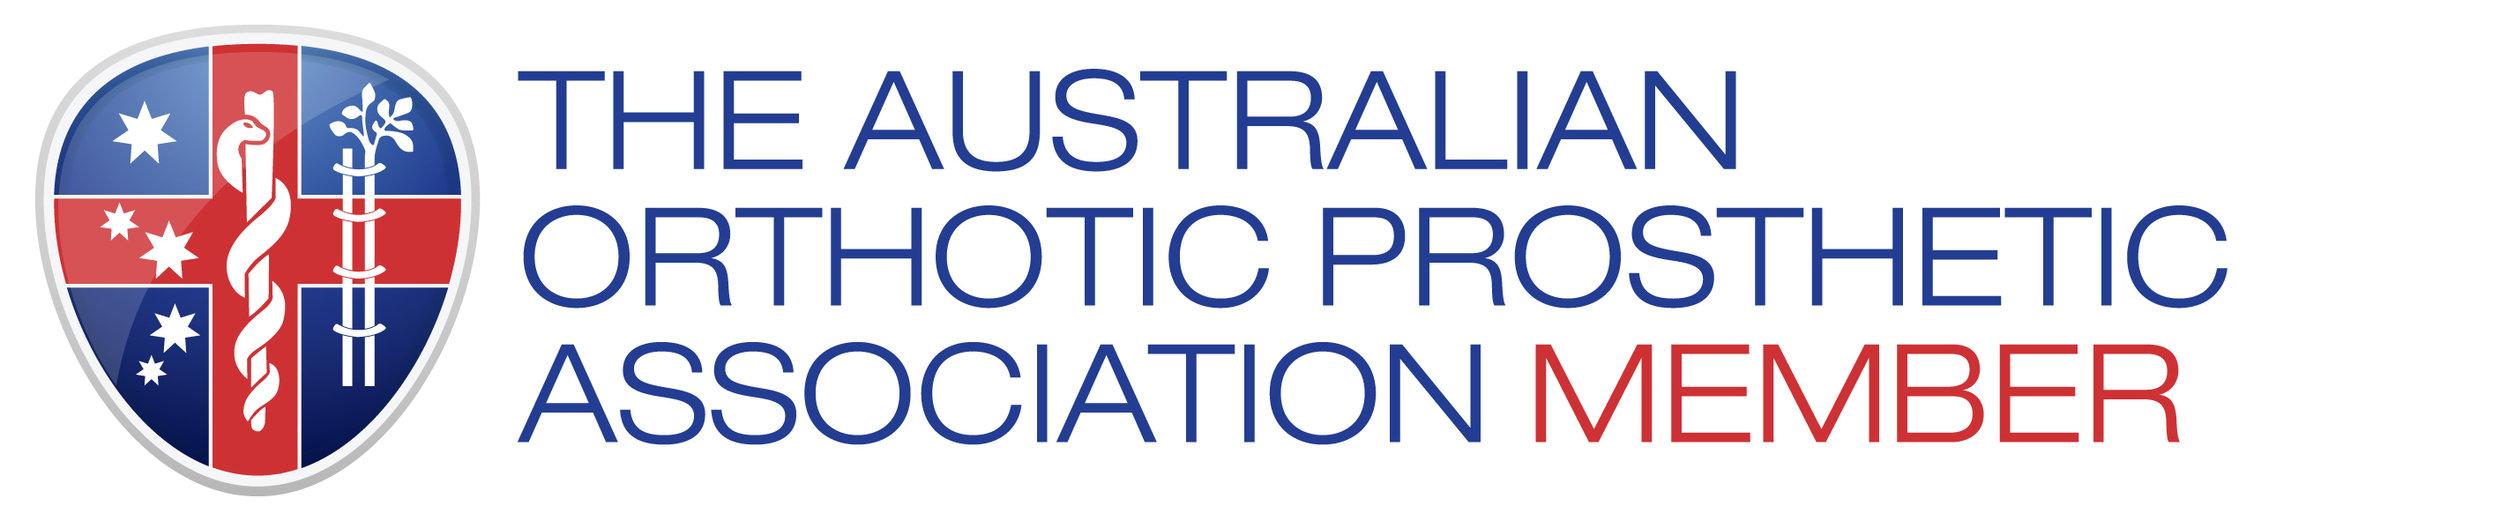 AOPA Member Logo.jpg